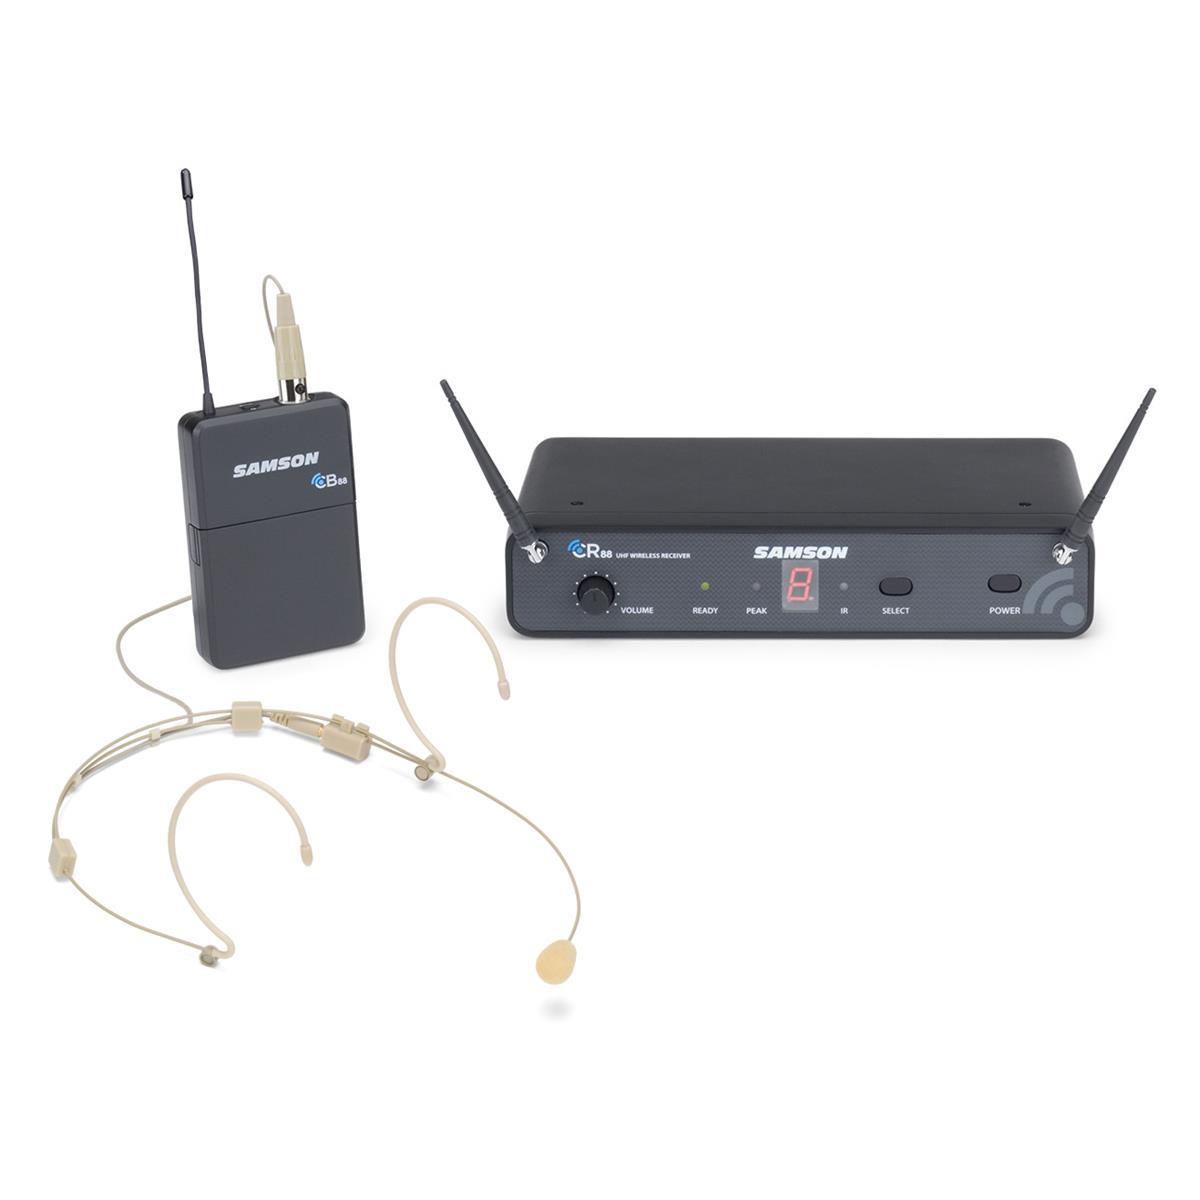 Samson CONCERT 88 UHF Earset System - F (863-865 MHz)